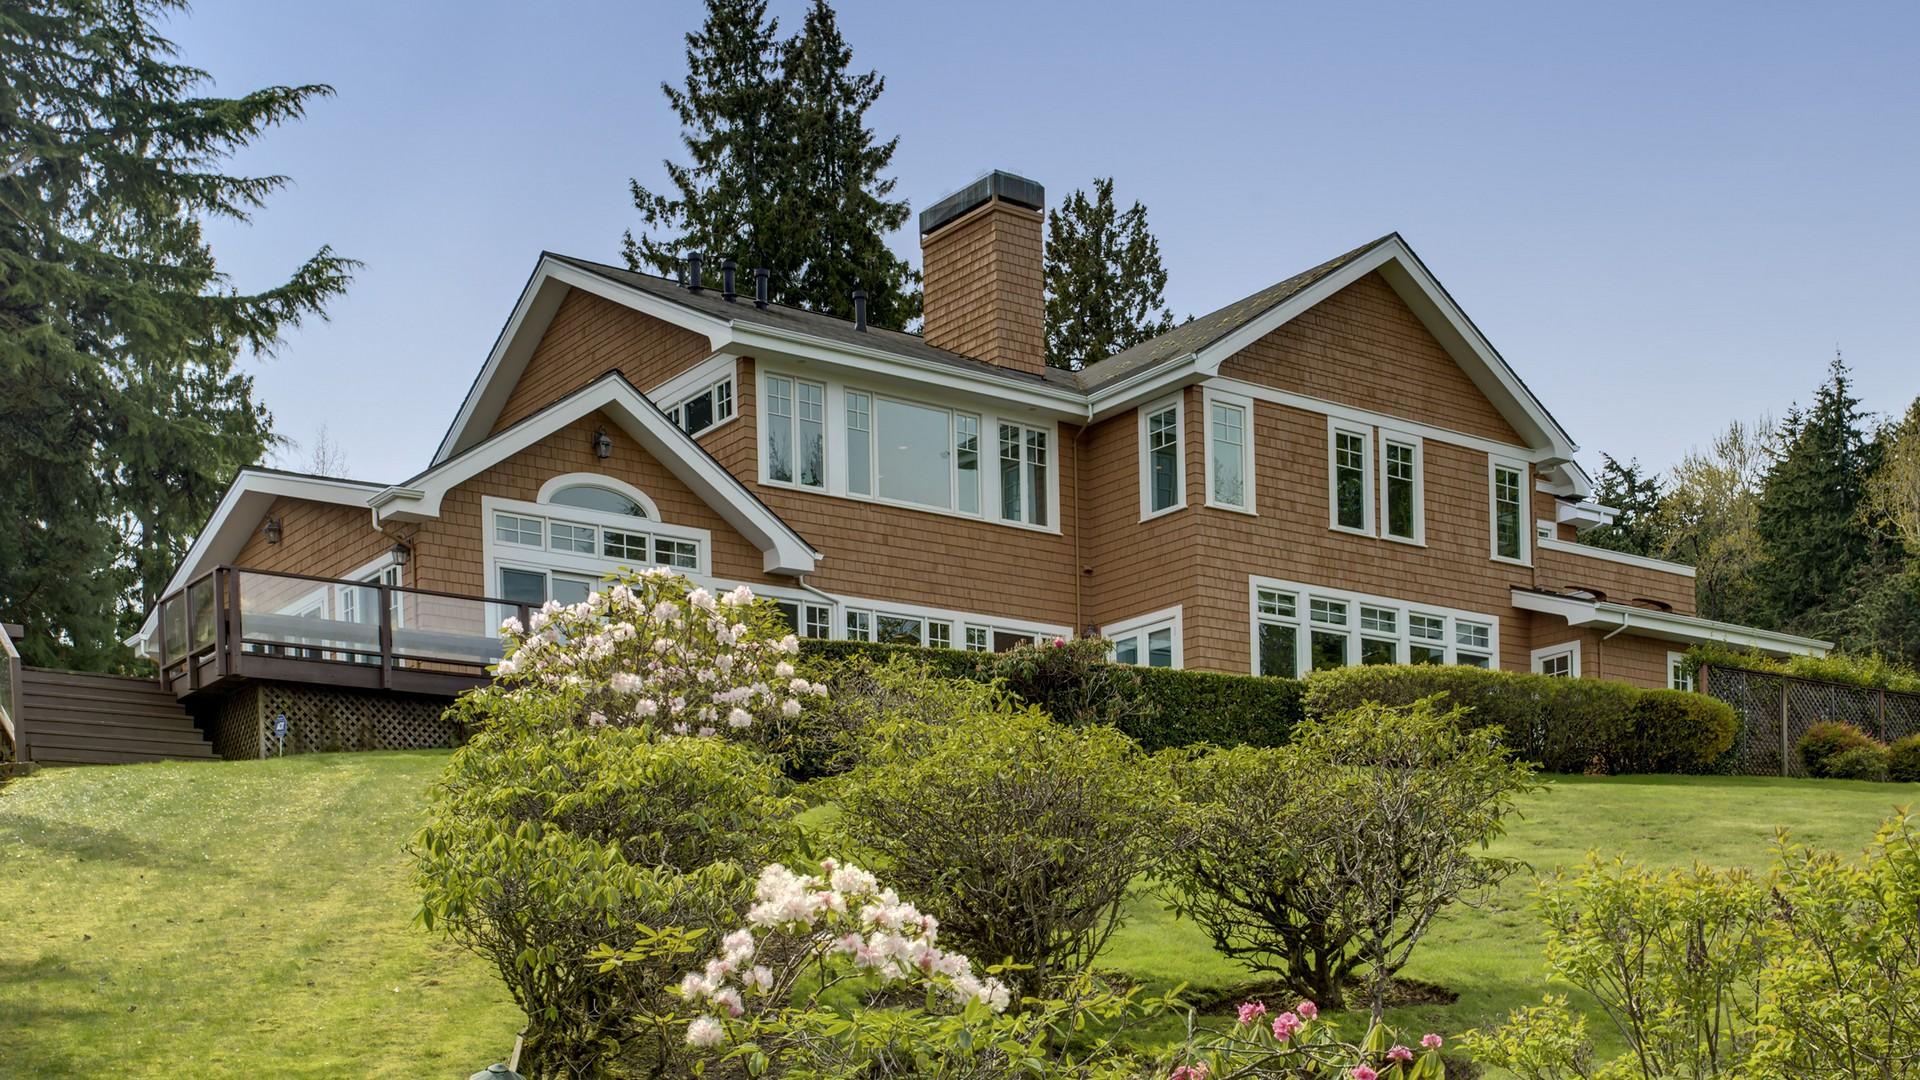 Single Family Home for Sale at Medina Fairweather xxxx Undisclosed Medina, Washington 98039 United States